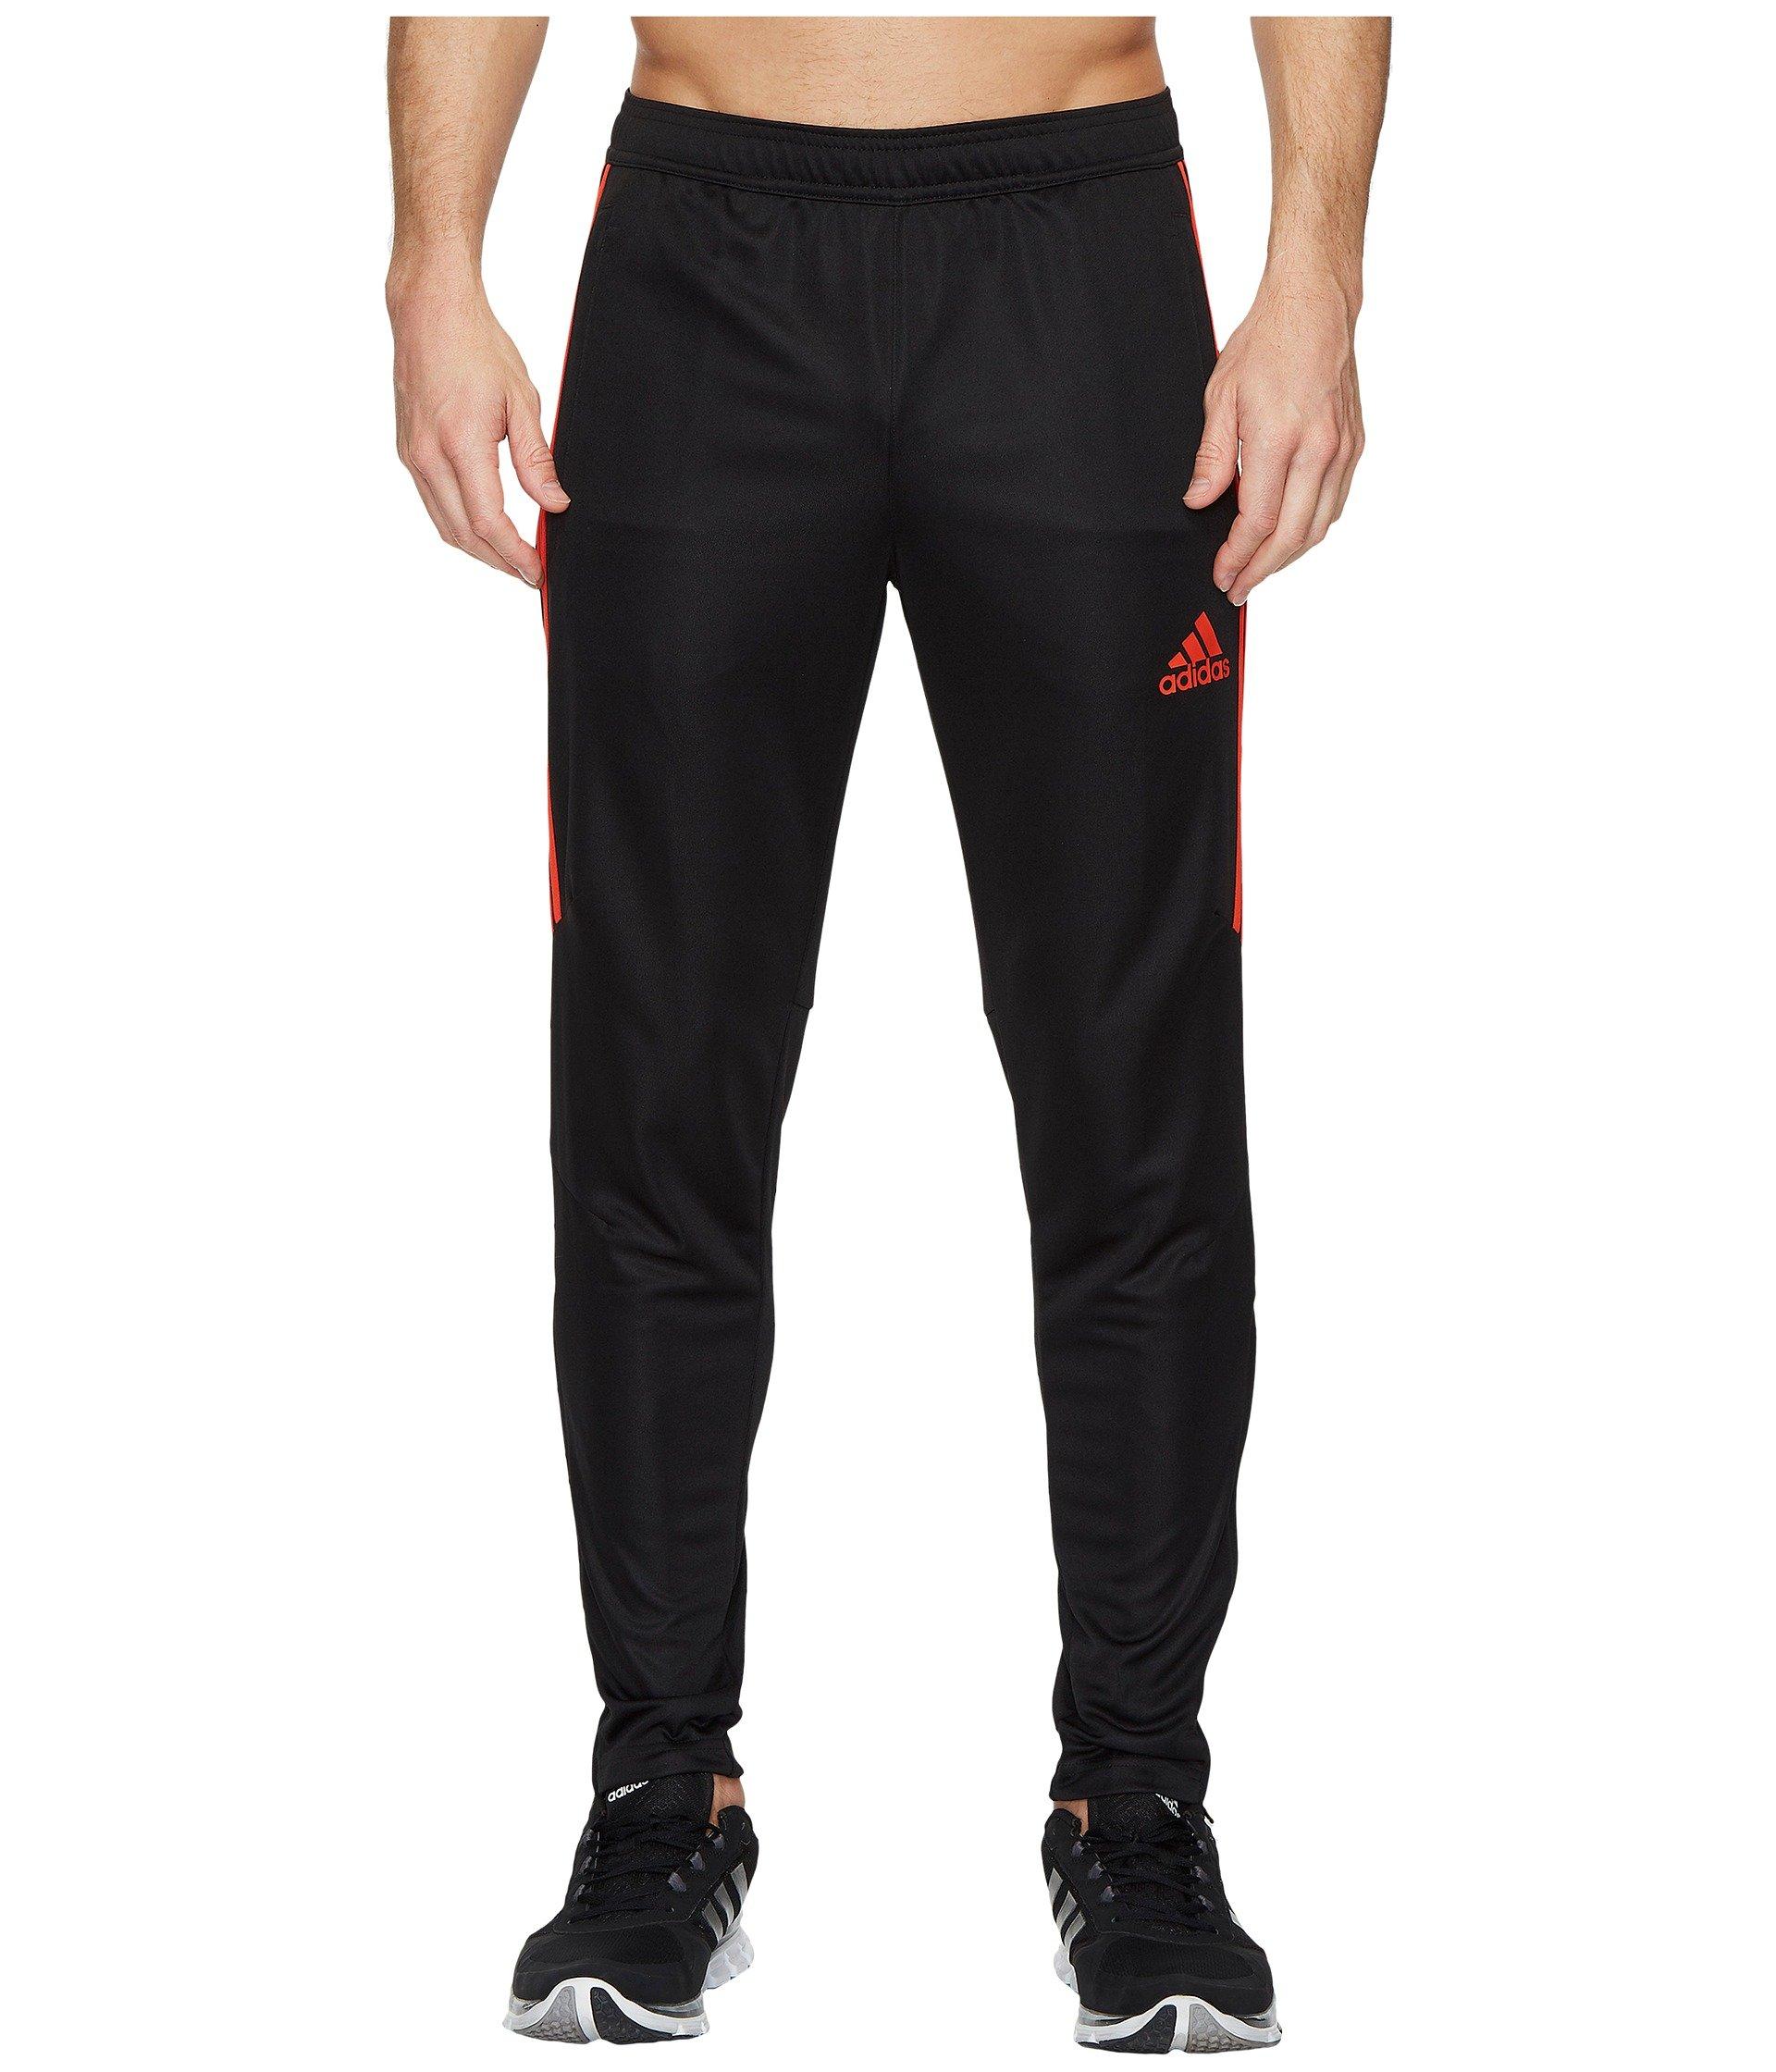 adidas Mens Tiro17 TRG Pant, Black/Red, Medium